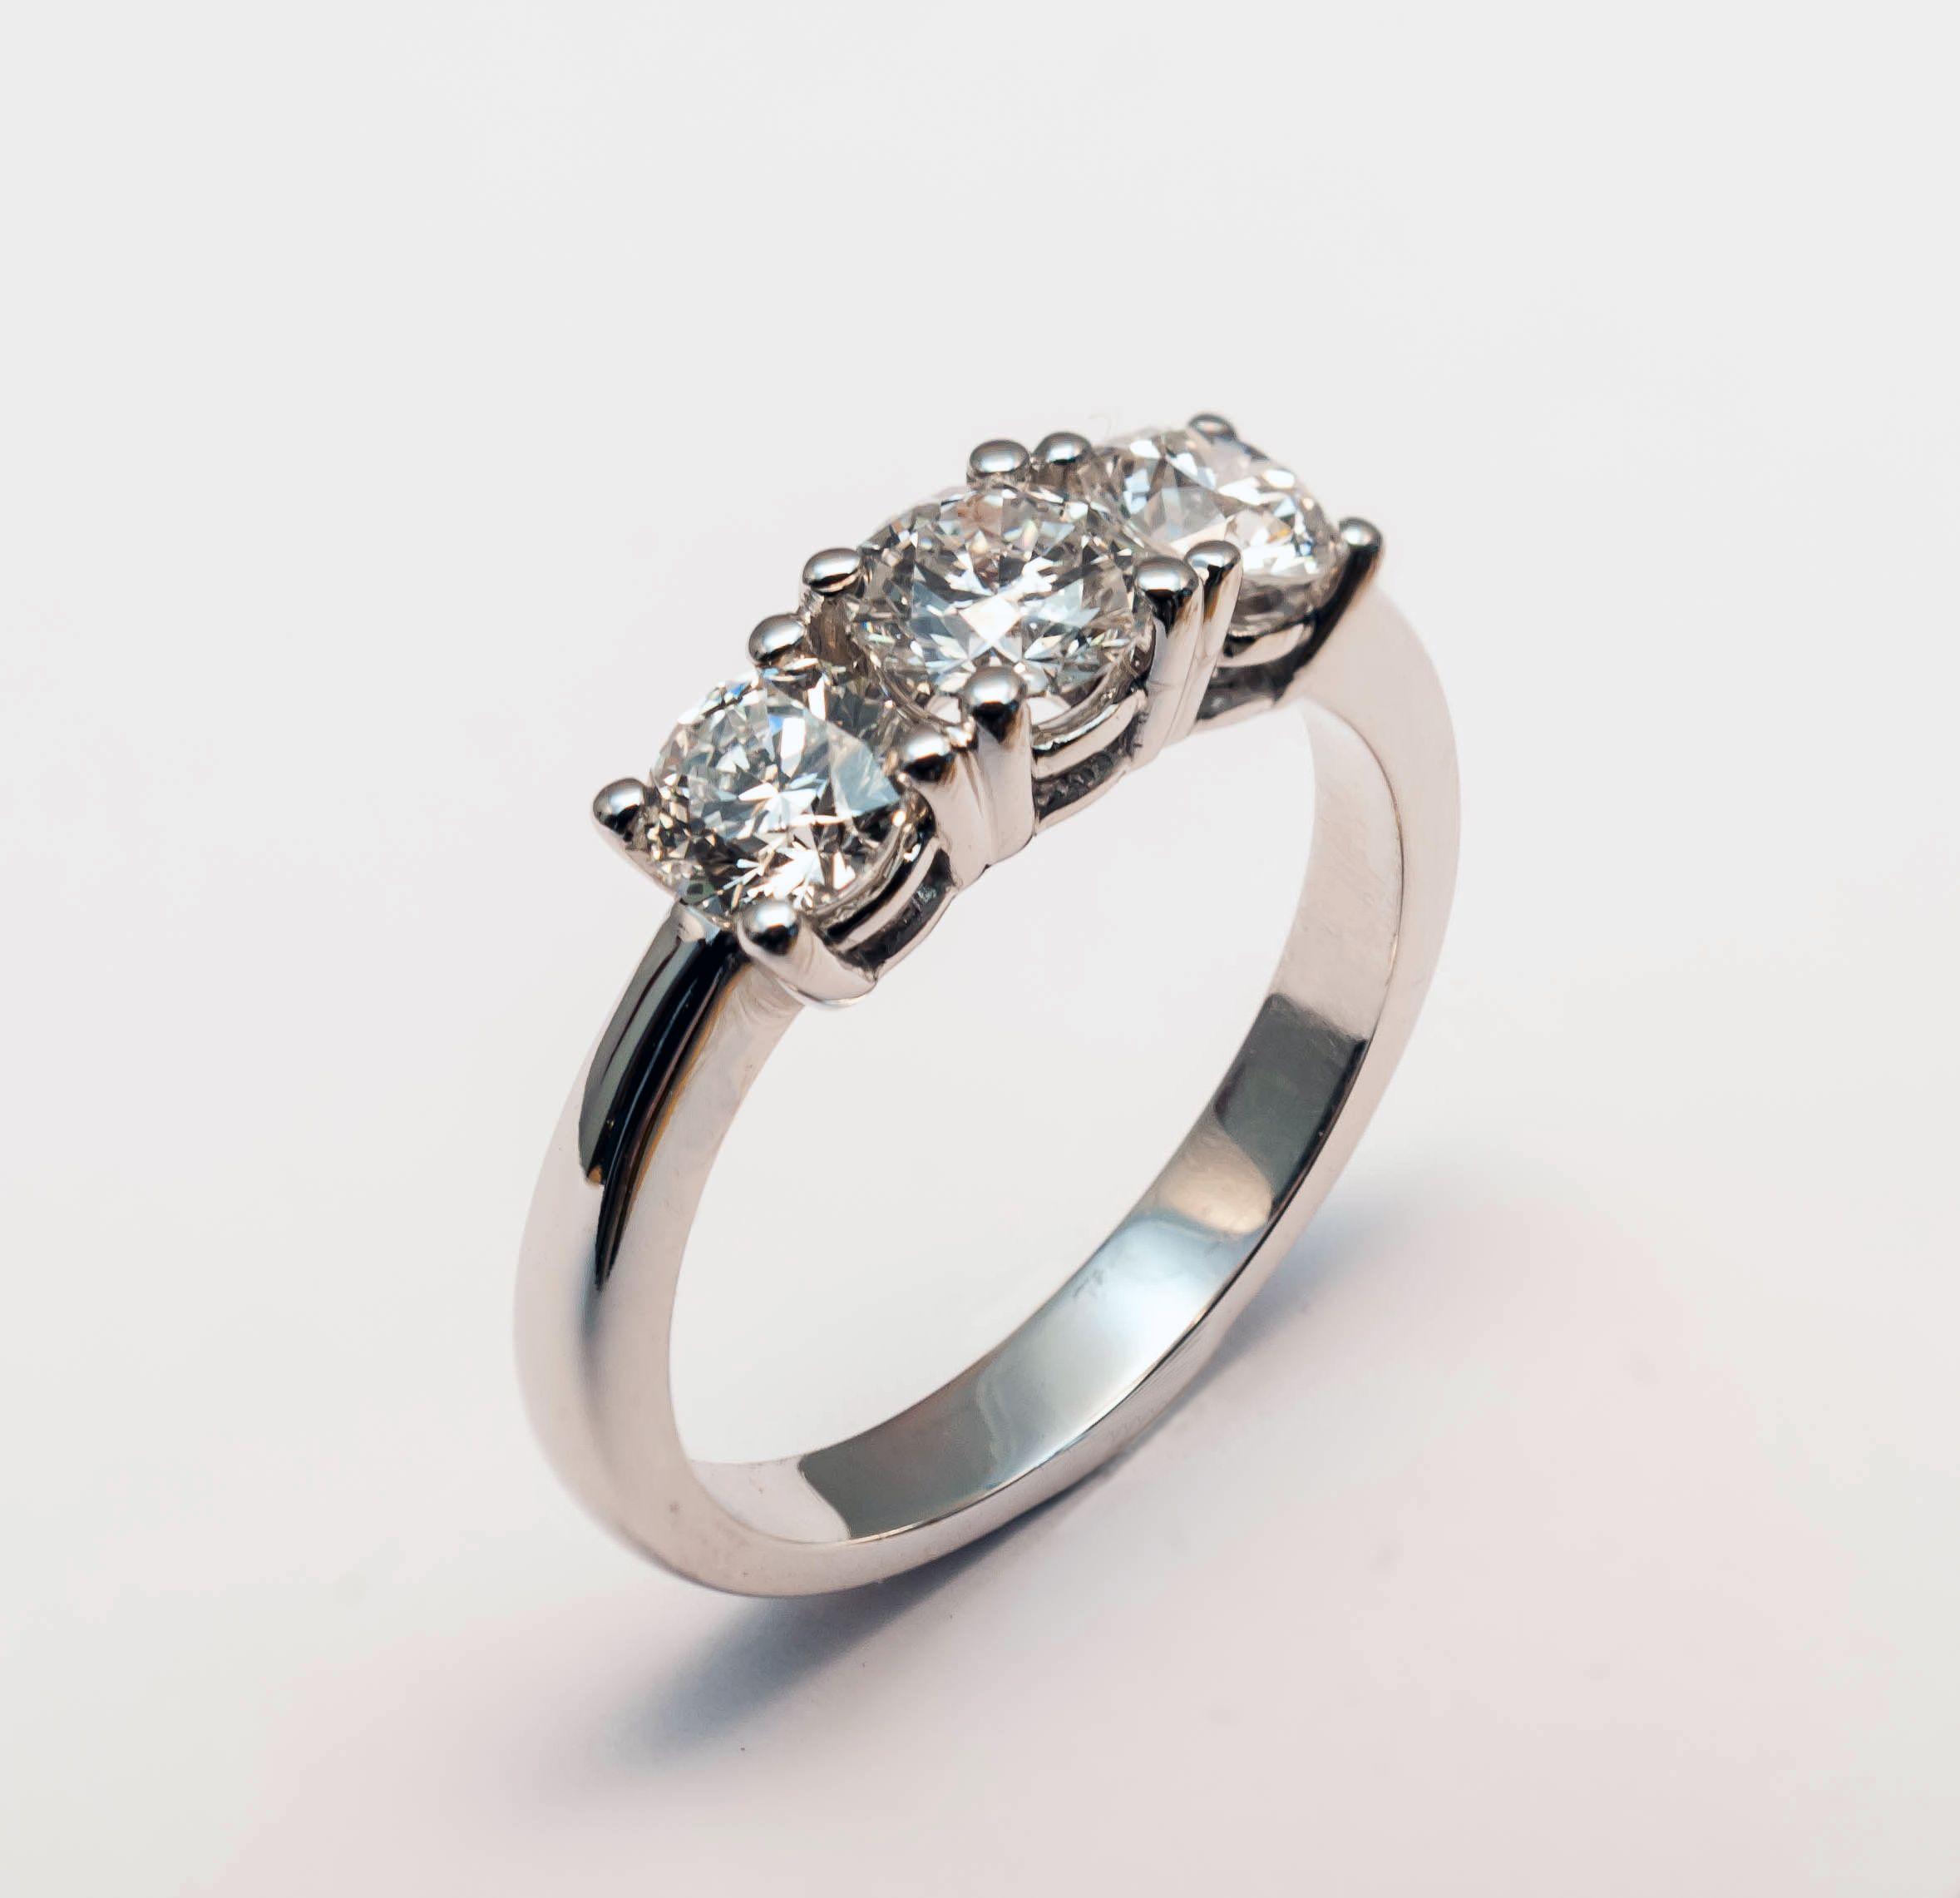 ae18a95bc15c Trinity Diamond.  JordanJoyeros  fabricantes  diseño  joyeria  design   jewelry